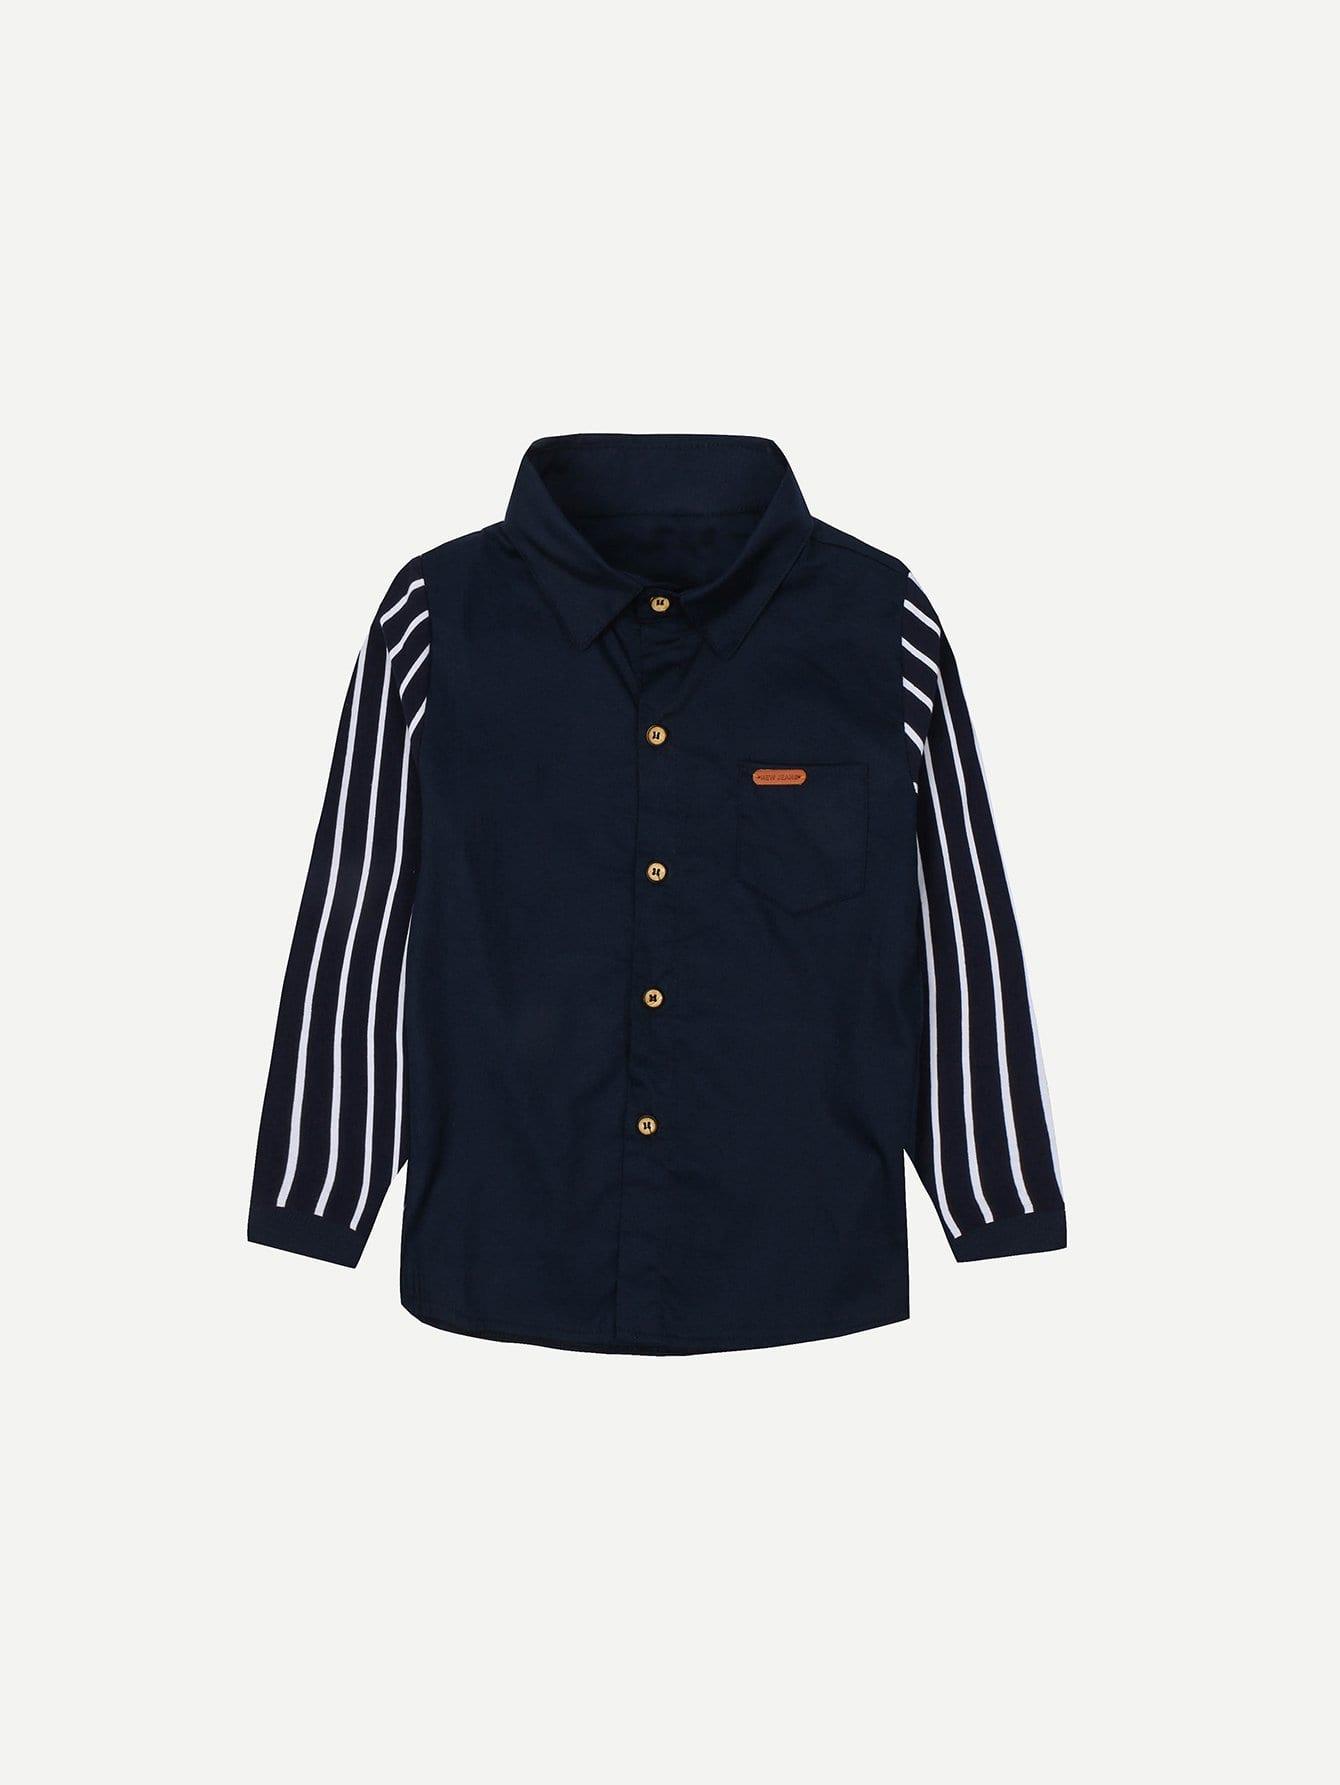 Boys Contrast Striped Sleeve Shirt